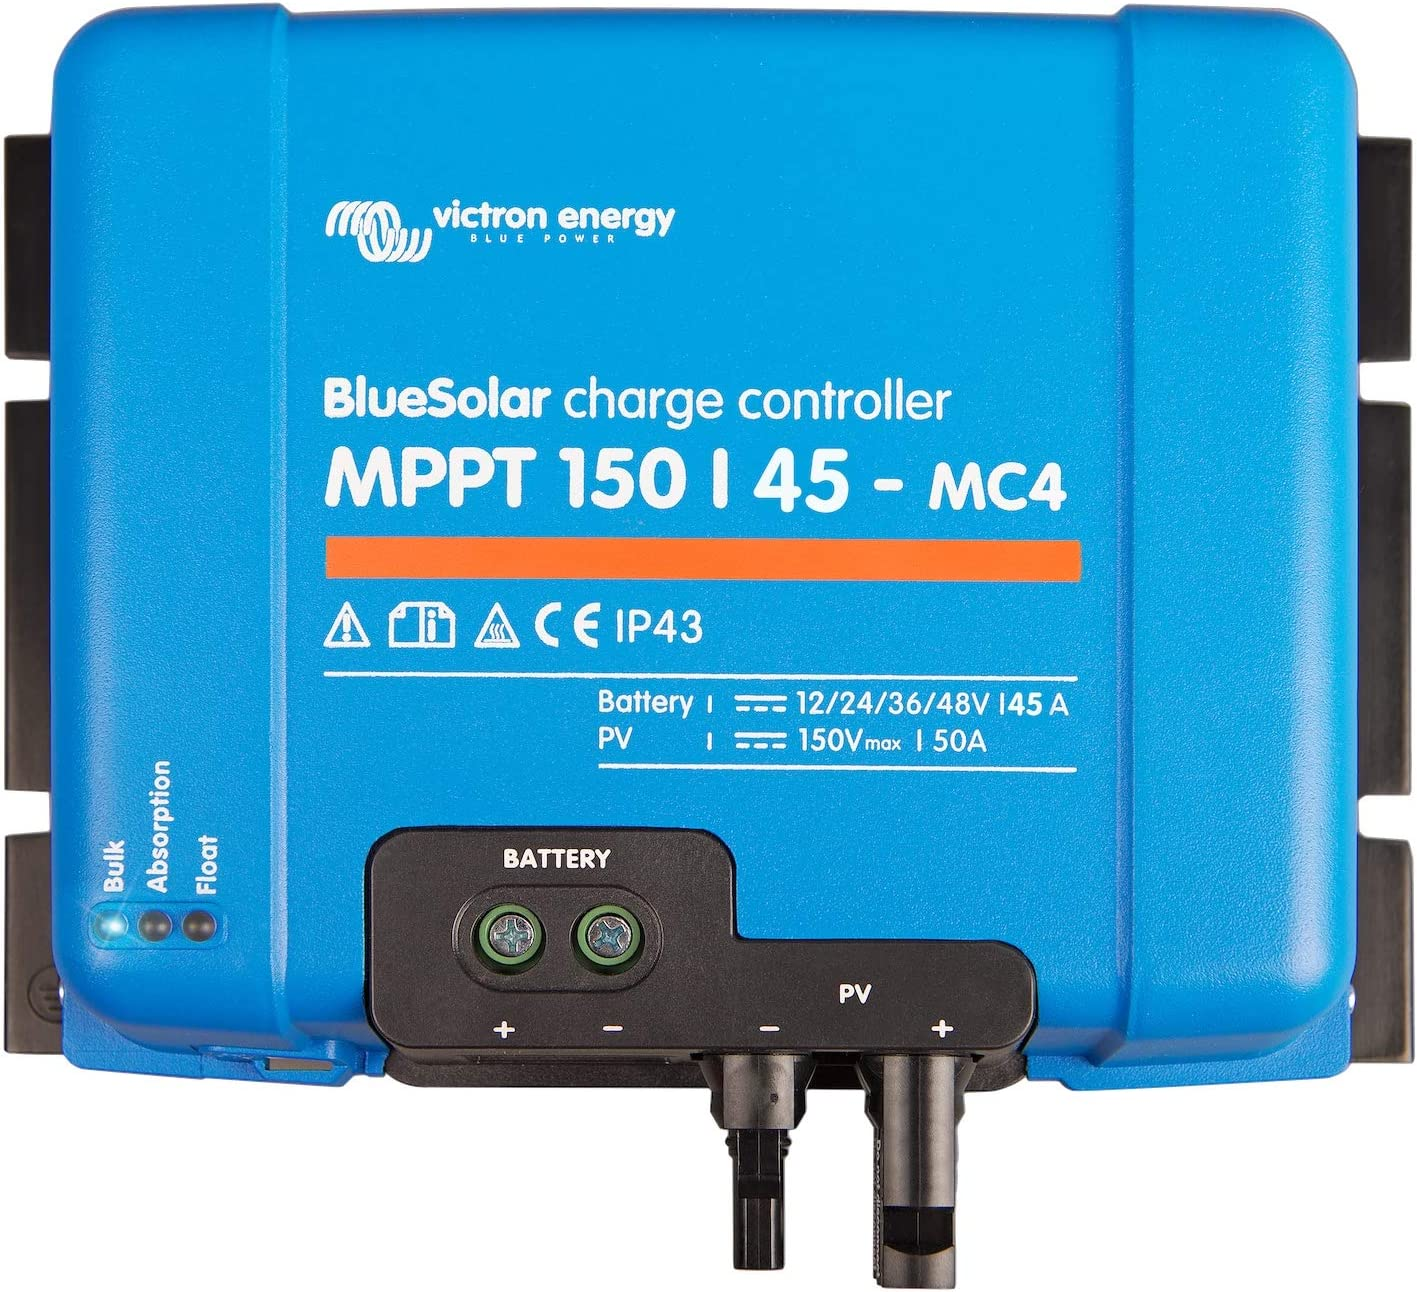 Victron Energy BlueSolar regulador solar MPPT 150/45-mc412/24/36/48V 45A